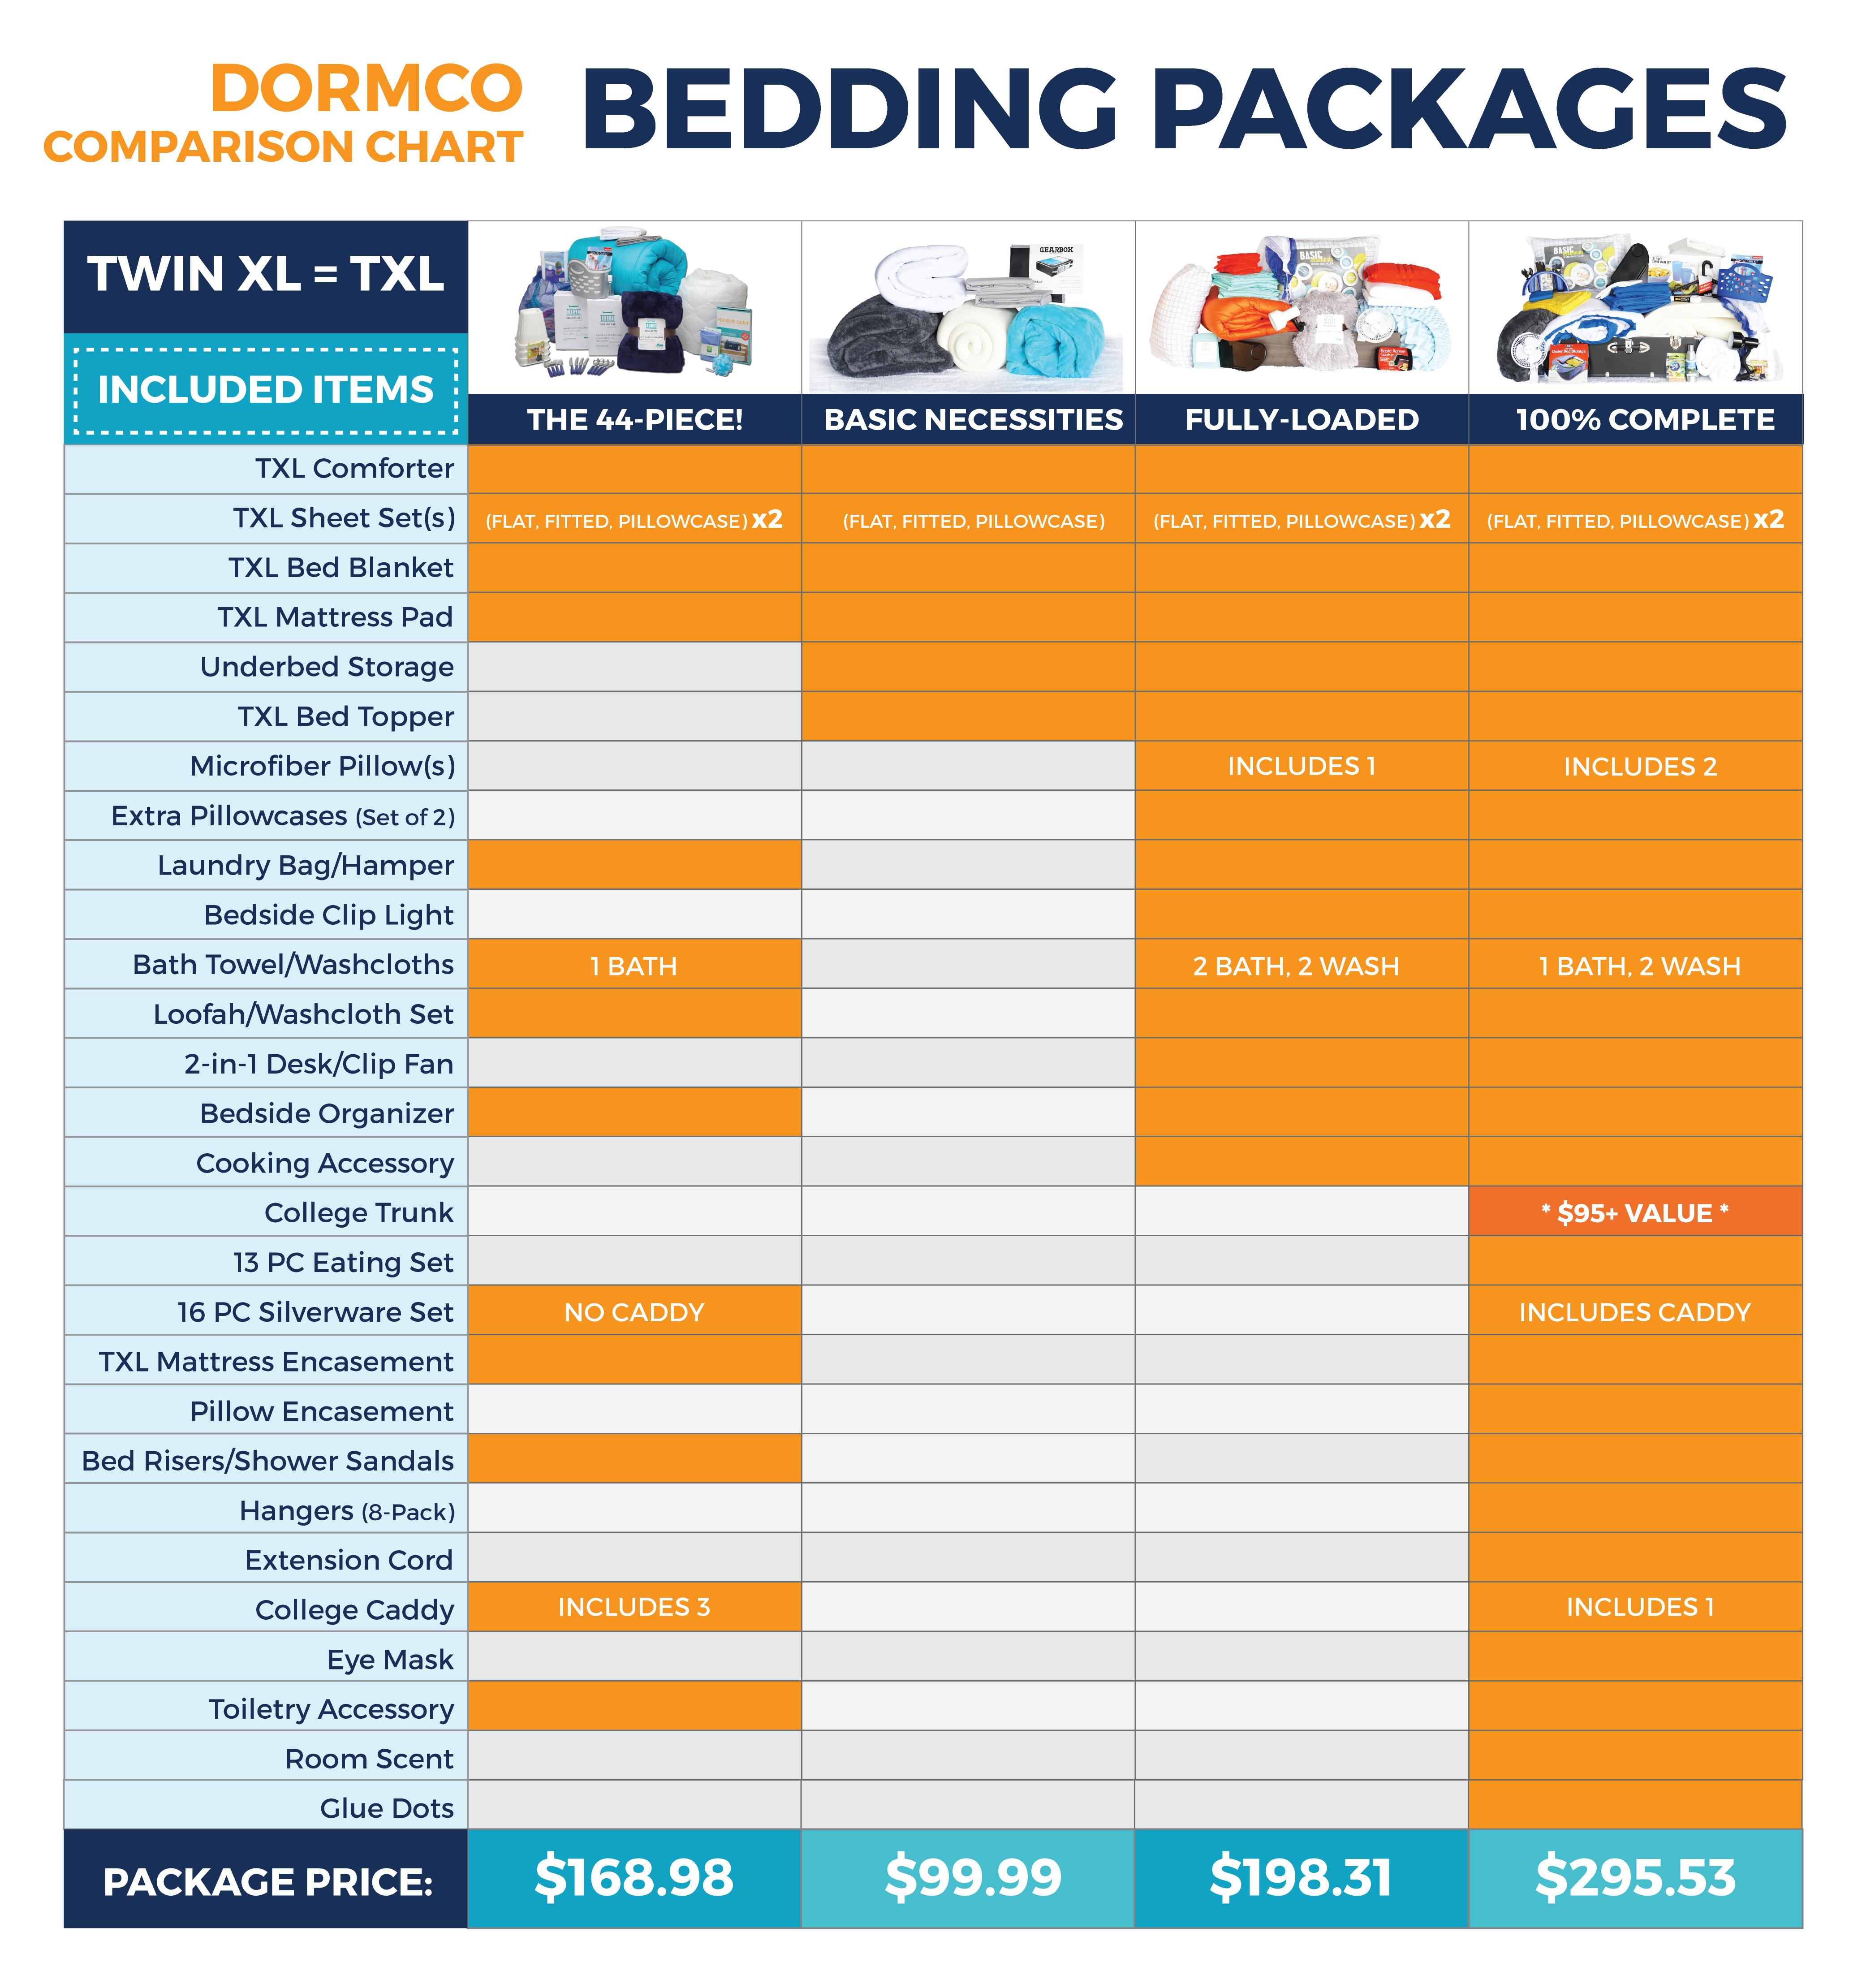 Basic Necessities Dorm Room Bedding Package